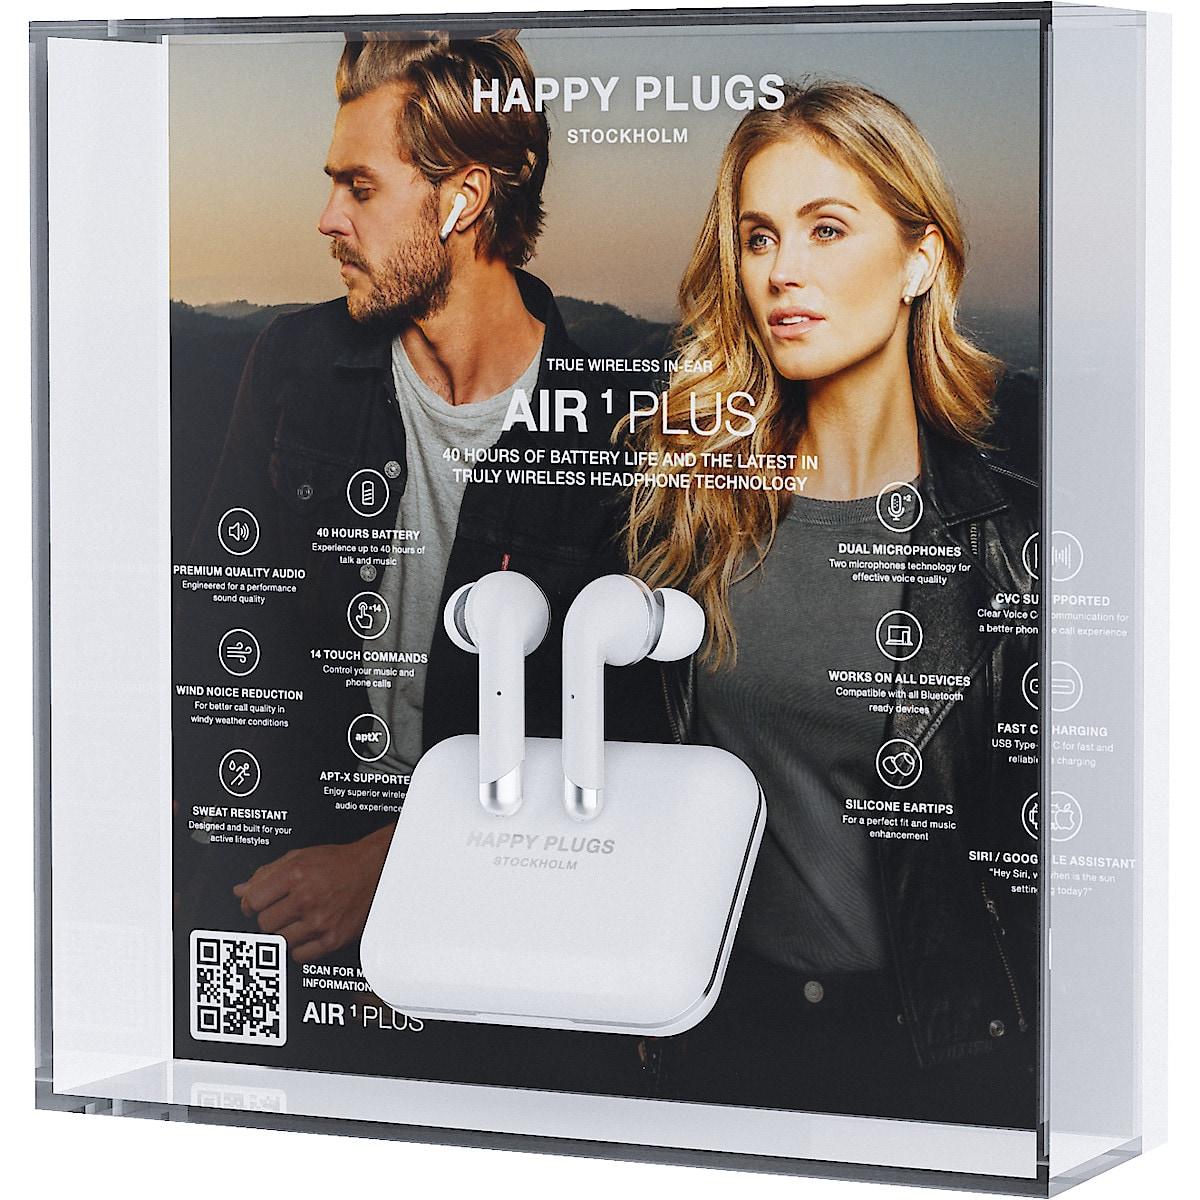 Happy Plugs Air 1 Plus in-ear, trådlösa hörlurar